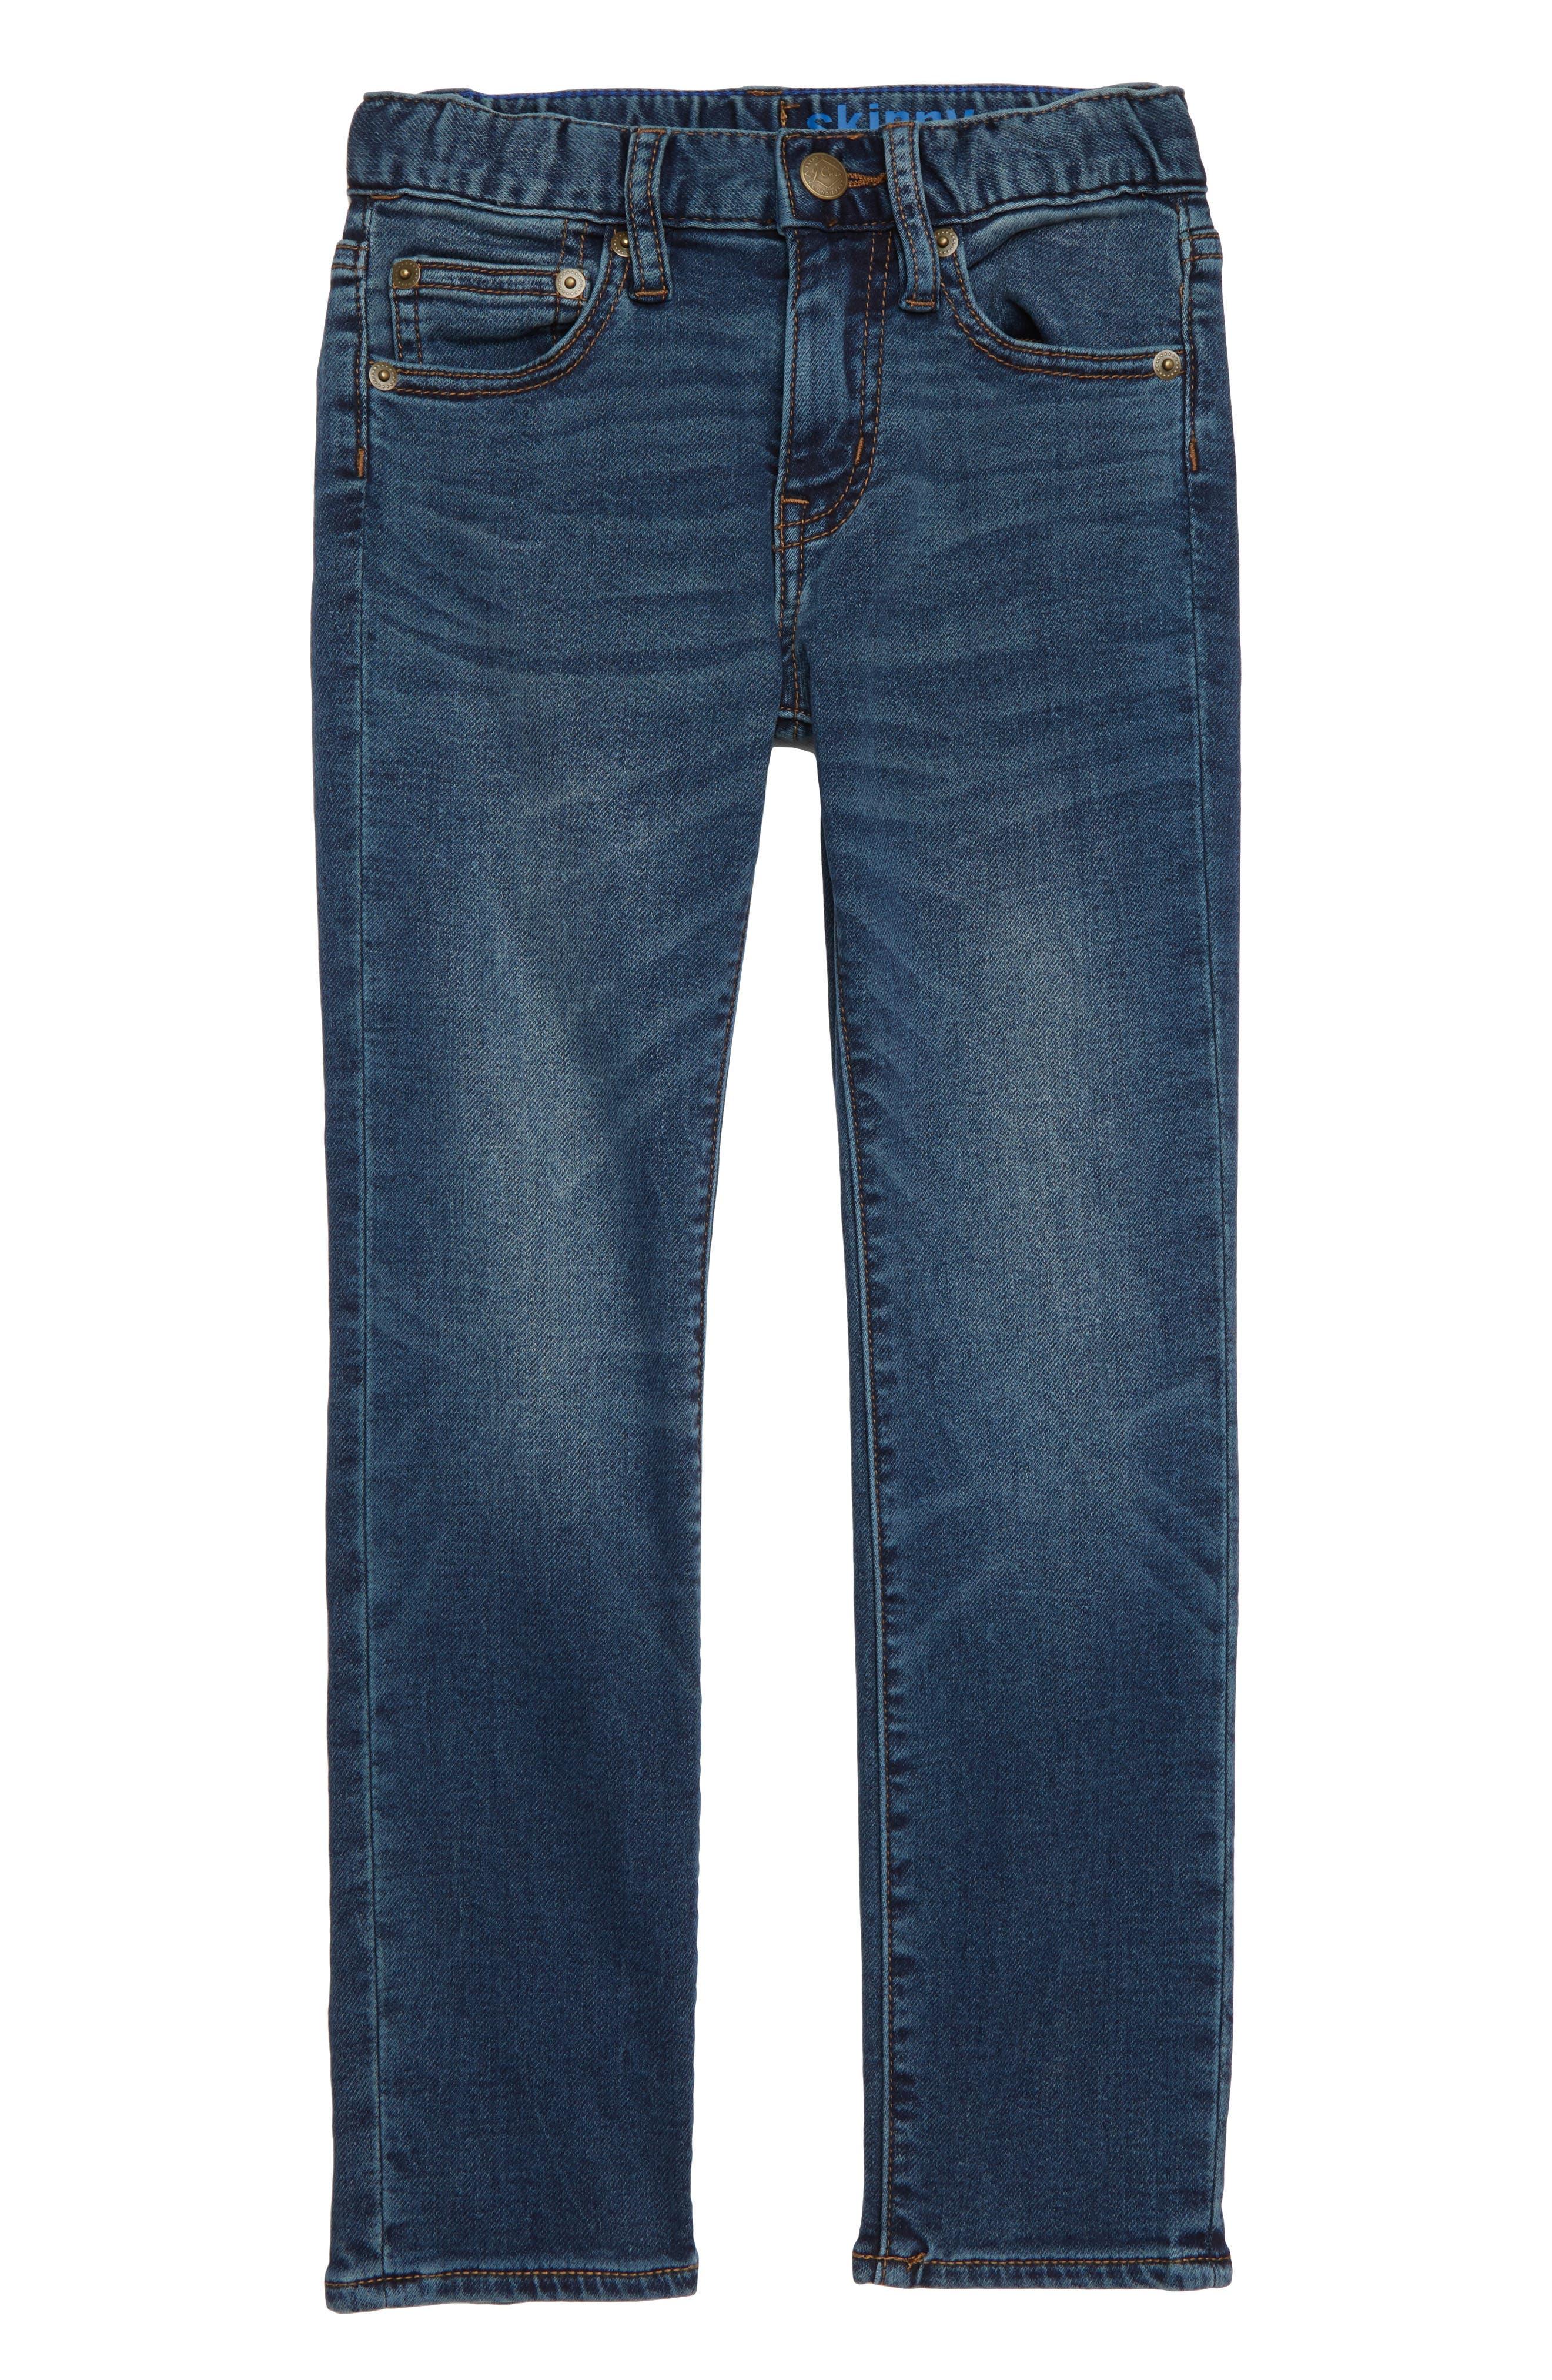 Runaround Skinny Jeans,                             Main thumbnail 1, color,                             400